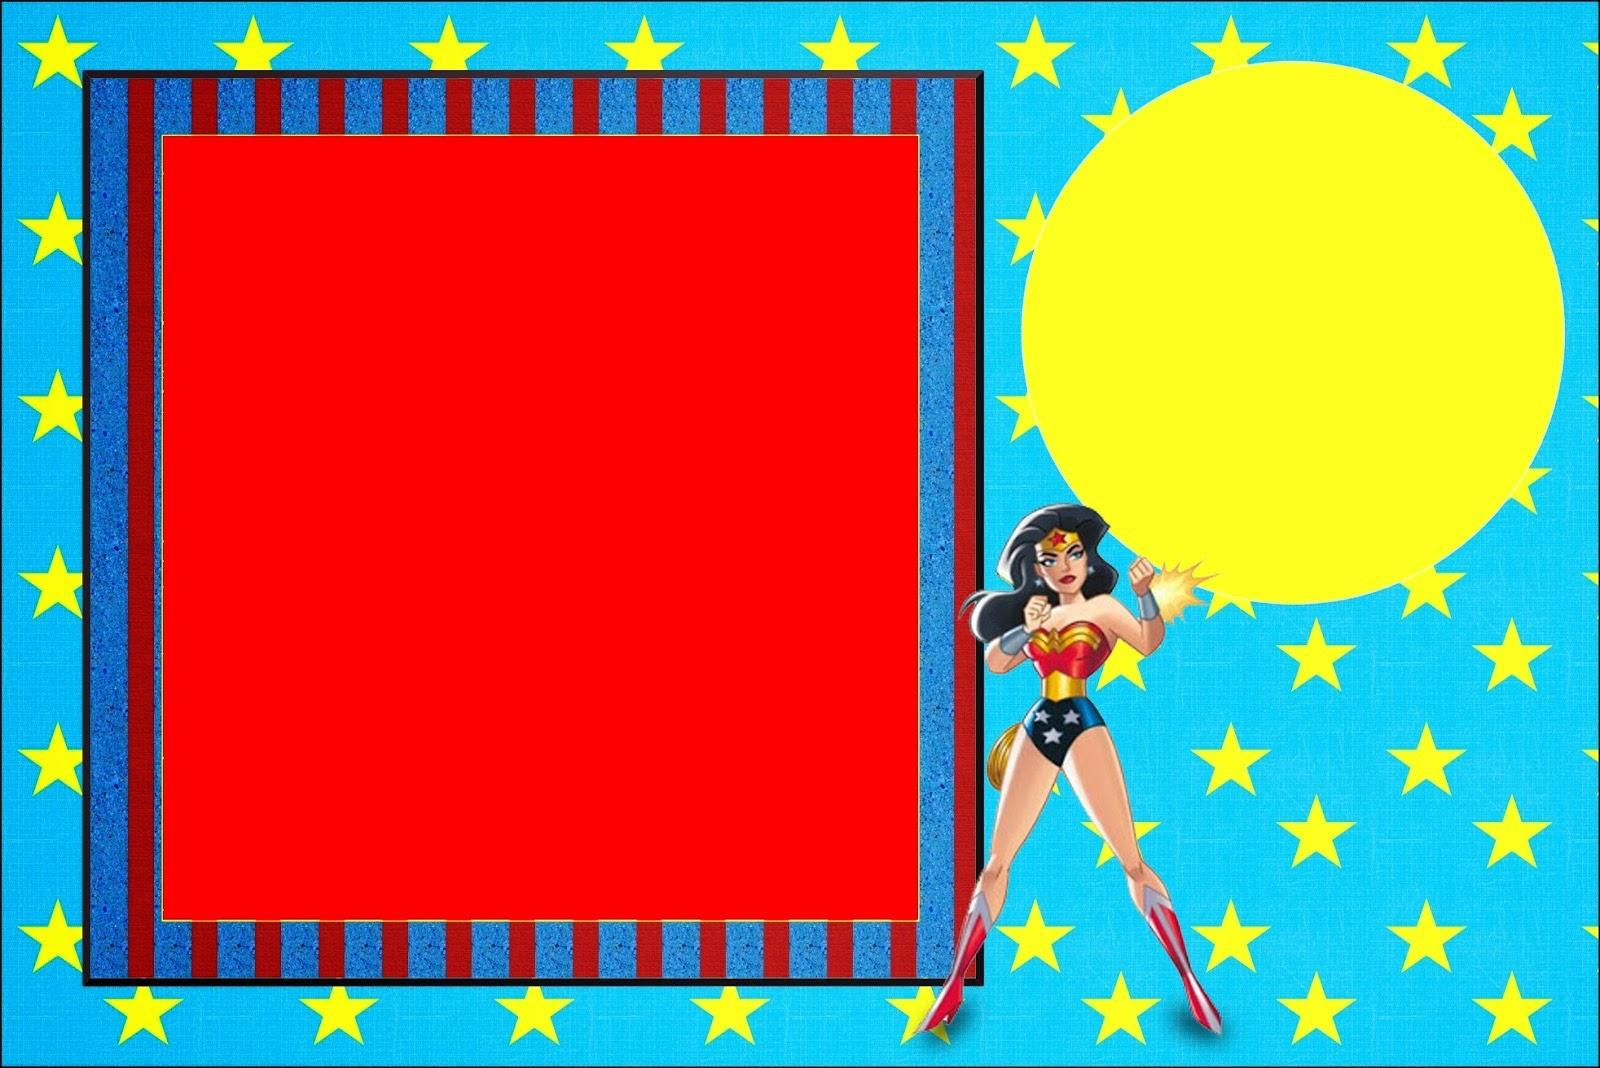 Wonder Woman:free Printable Invitations. - Oh My Fiesta! For Geeks - Free Wonder Woman Printables